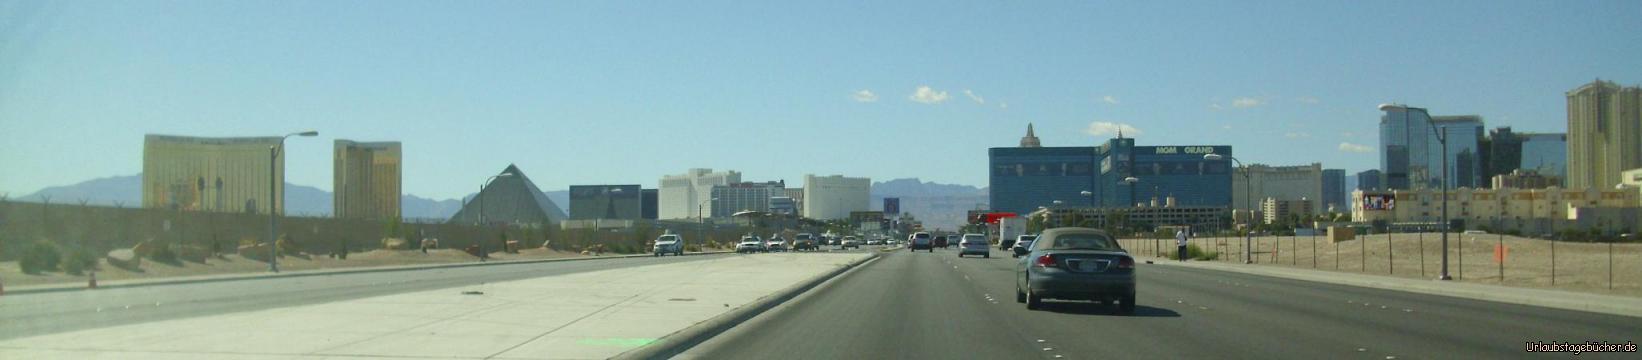 Las Vegas Skyline: auf dem Weg zurück in die Stadt fahren wir auf die Skyline von Las Vegas zu v.l.n.r.: Mandalay Bay, Delano, Luxor, Tropicana, MGM Grand, CityCenter